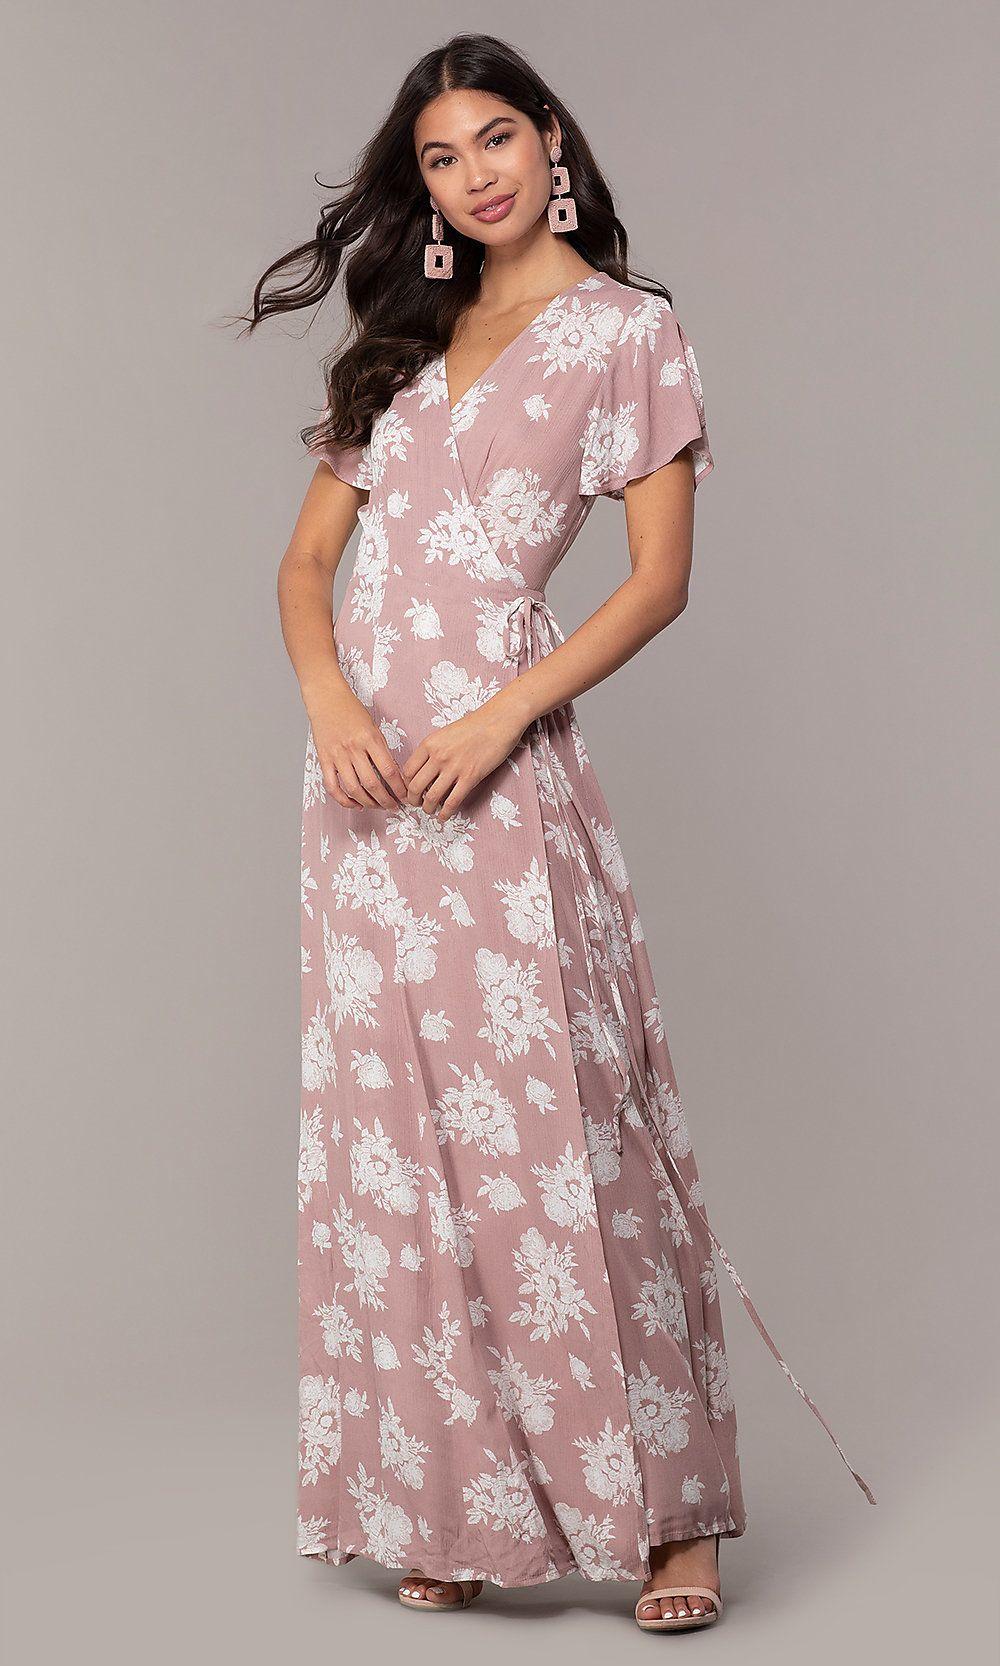 Short Sleeve Print Long Wrap Wedding Guest Dress Dresses Long Wrap Dress Pink Long Dress